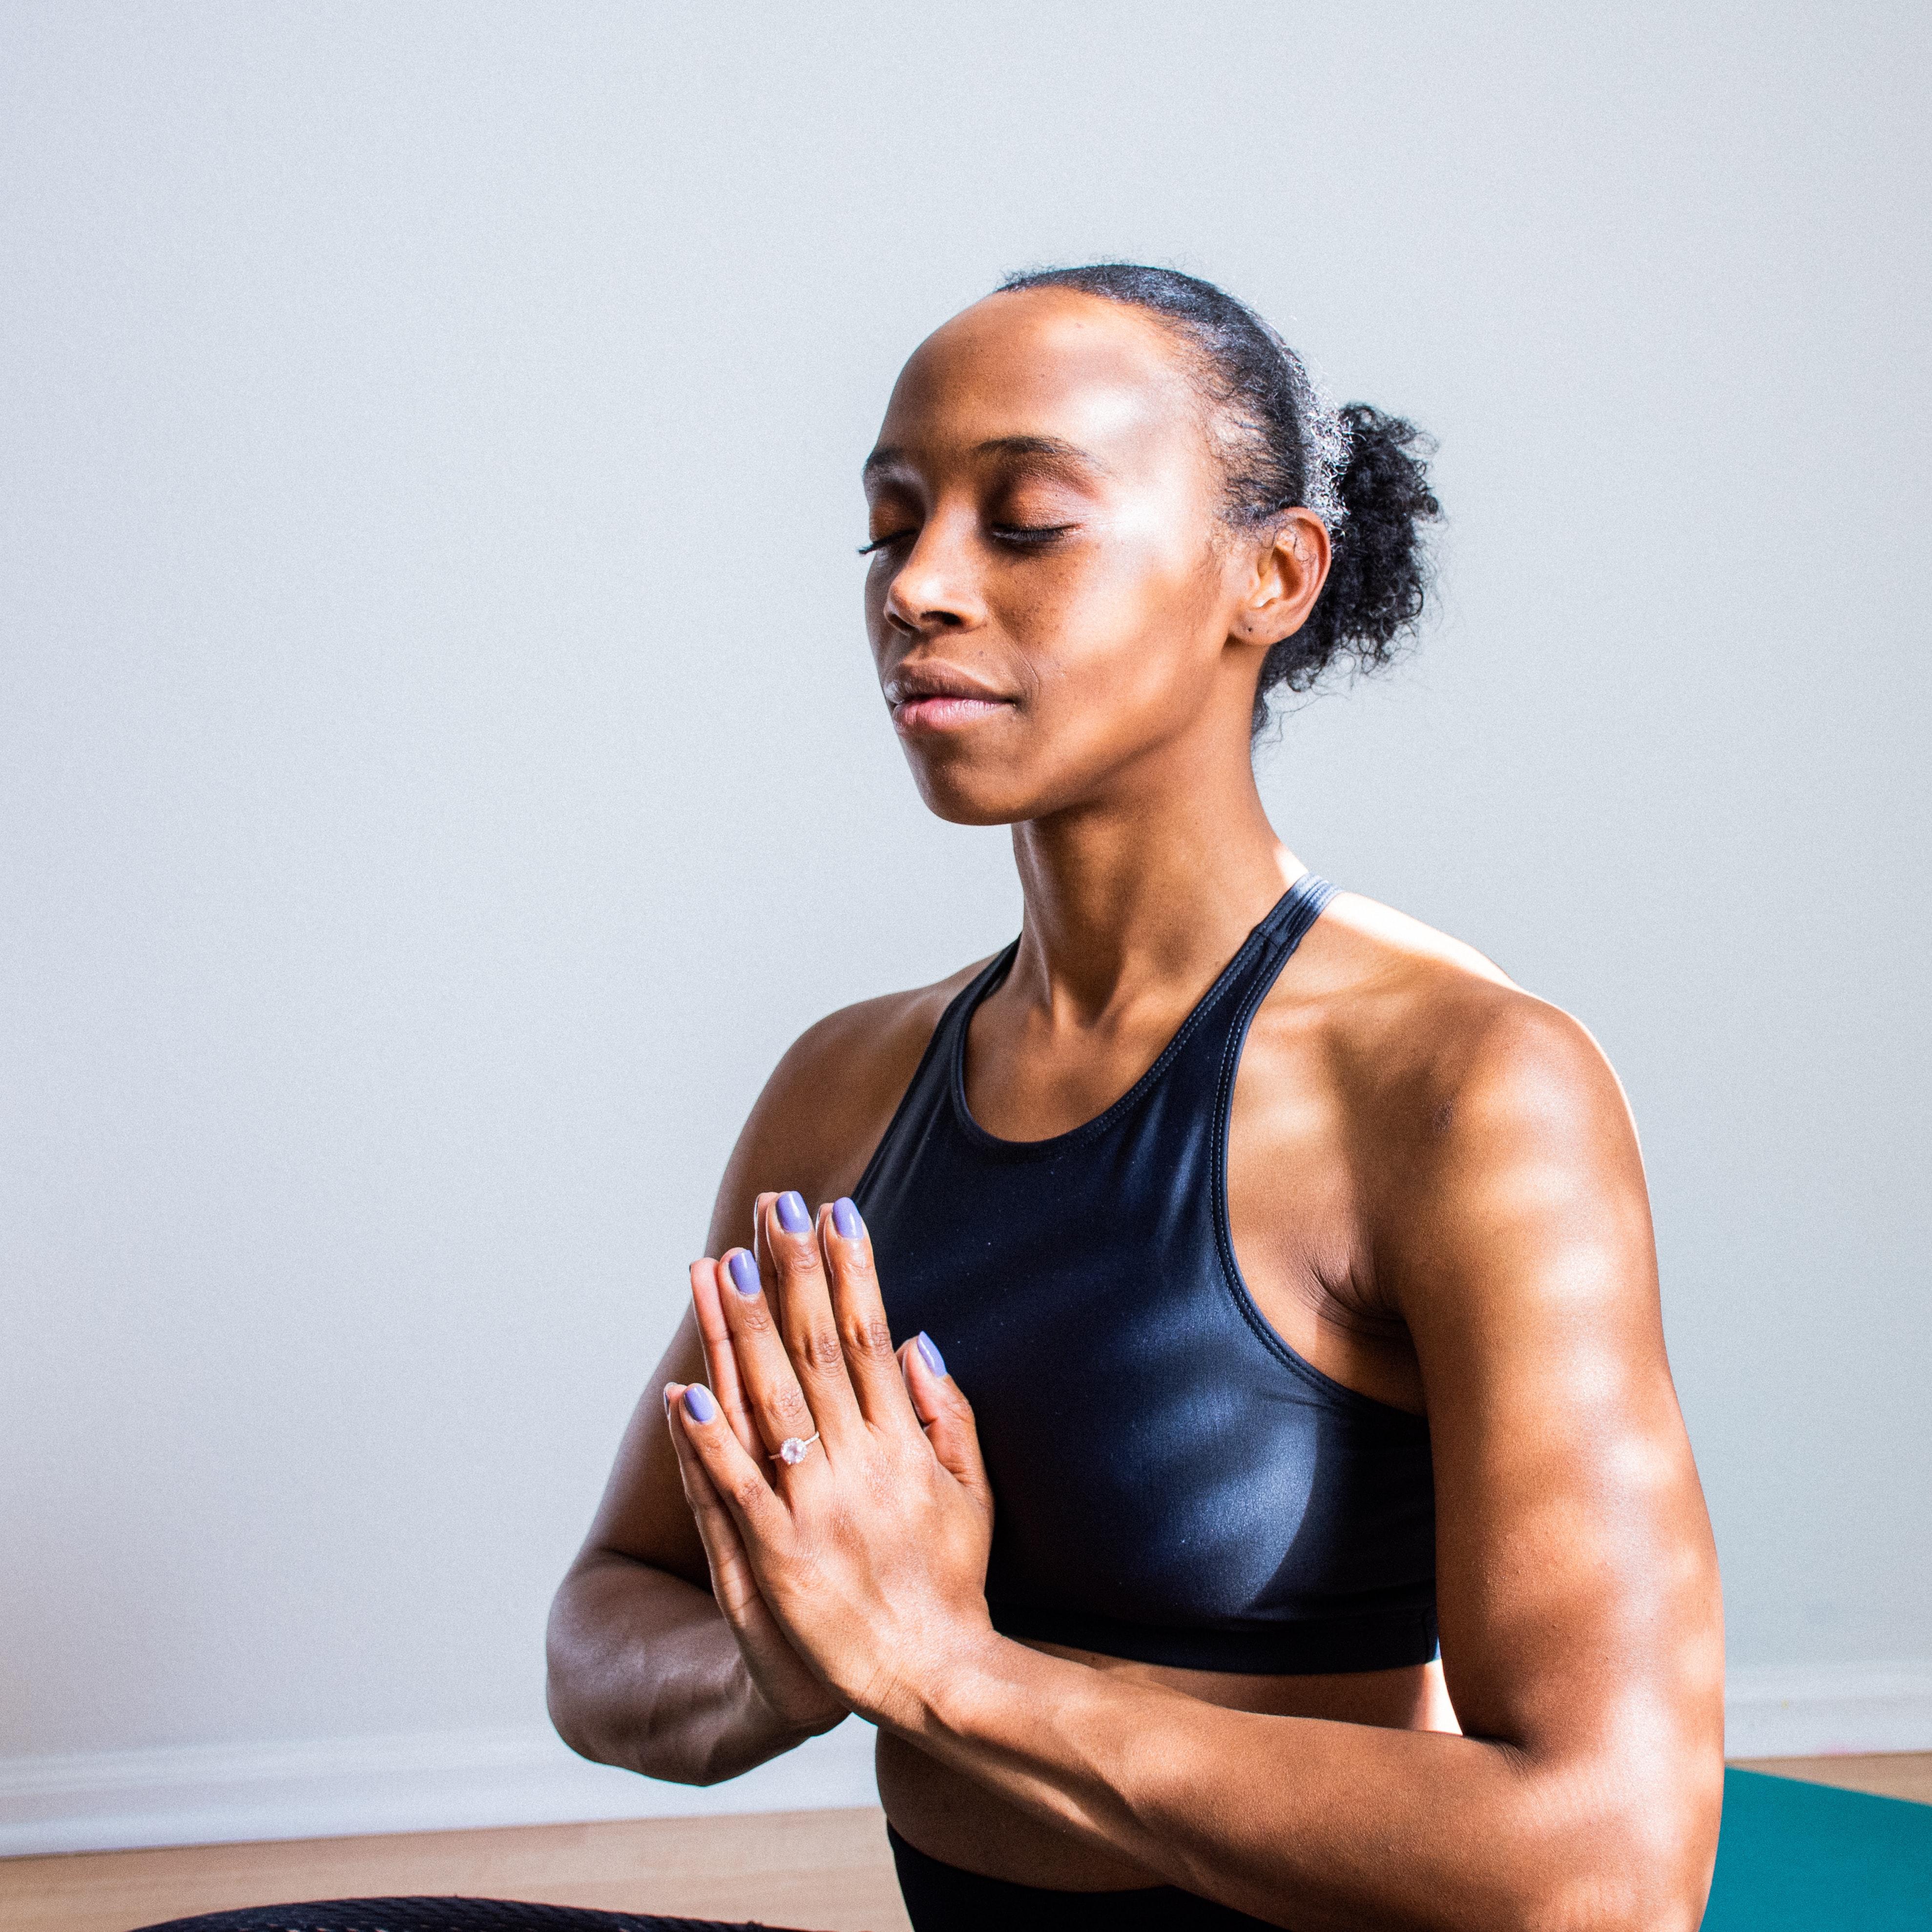 a person posing yoga